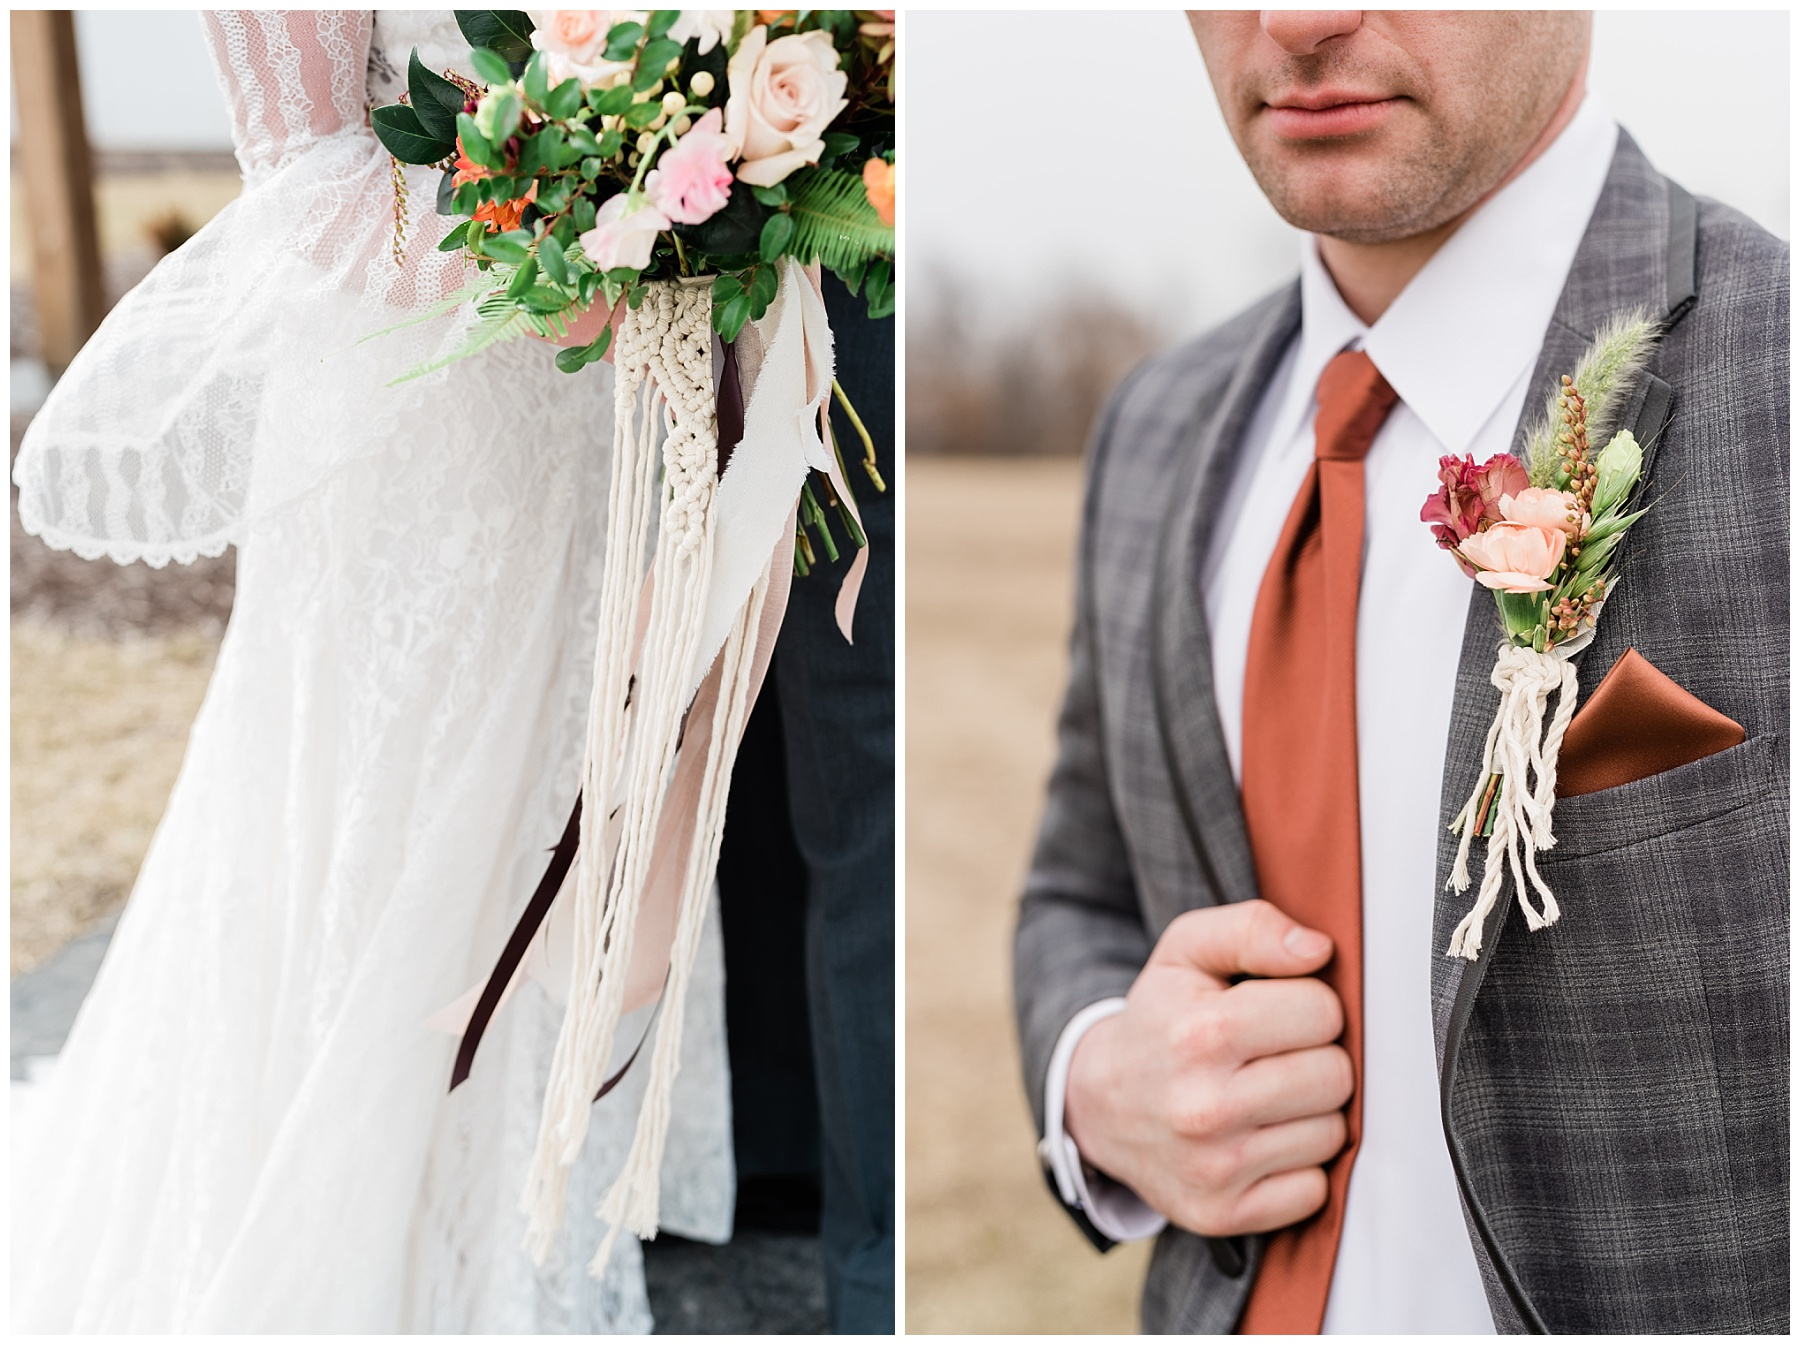 Eclectic Scandinavian Winter Wedding in All White Venue Emerson Fields by Kelsi Kliethermes Photography Best Missouri and Maui Wedding Photographer_0060.jpg